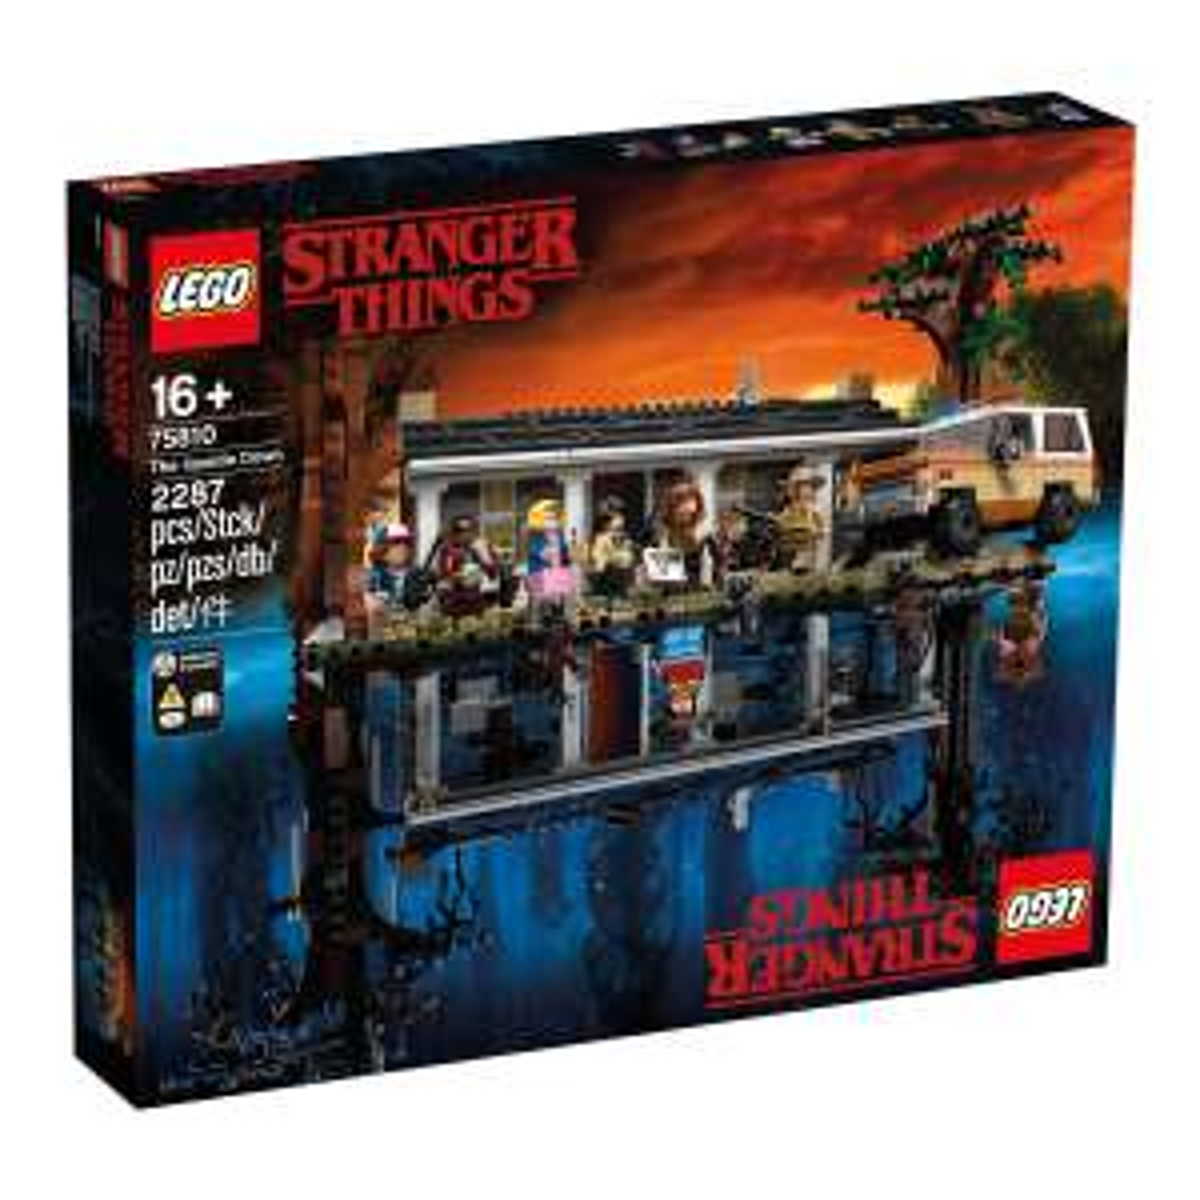 LEGO 75810 Stranger Things The Upside Down - El Corte Inglés